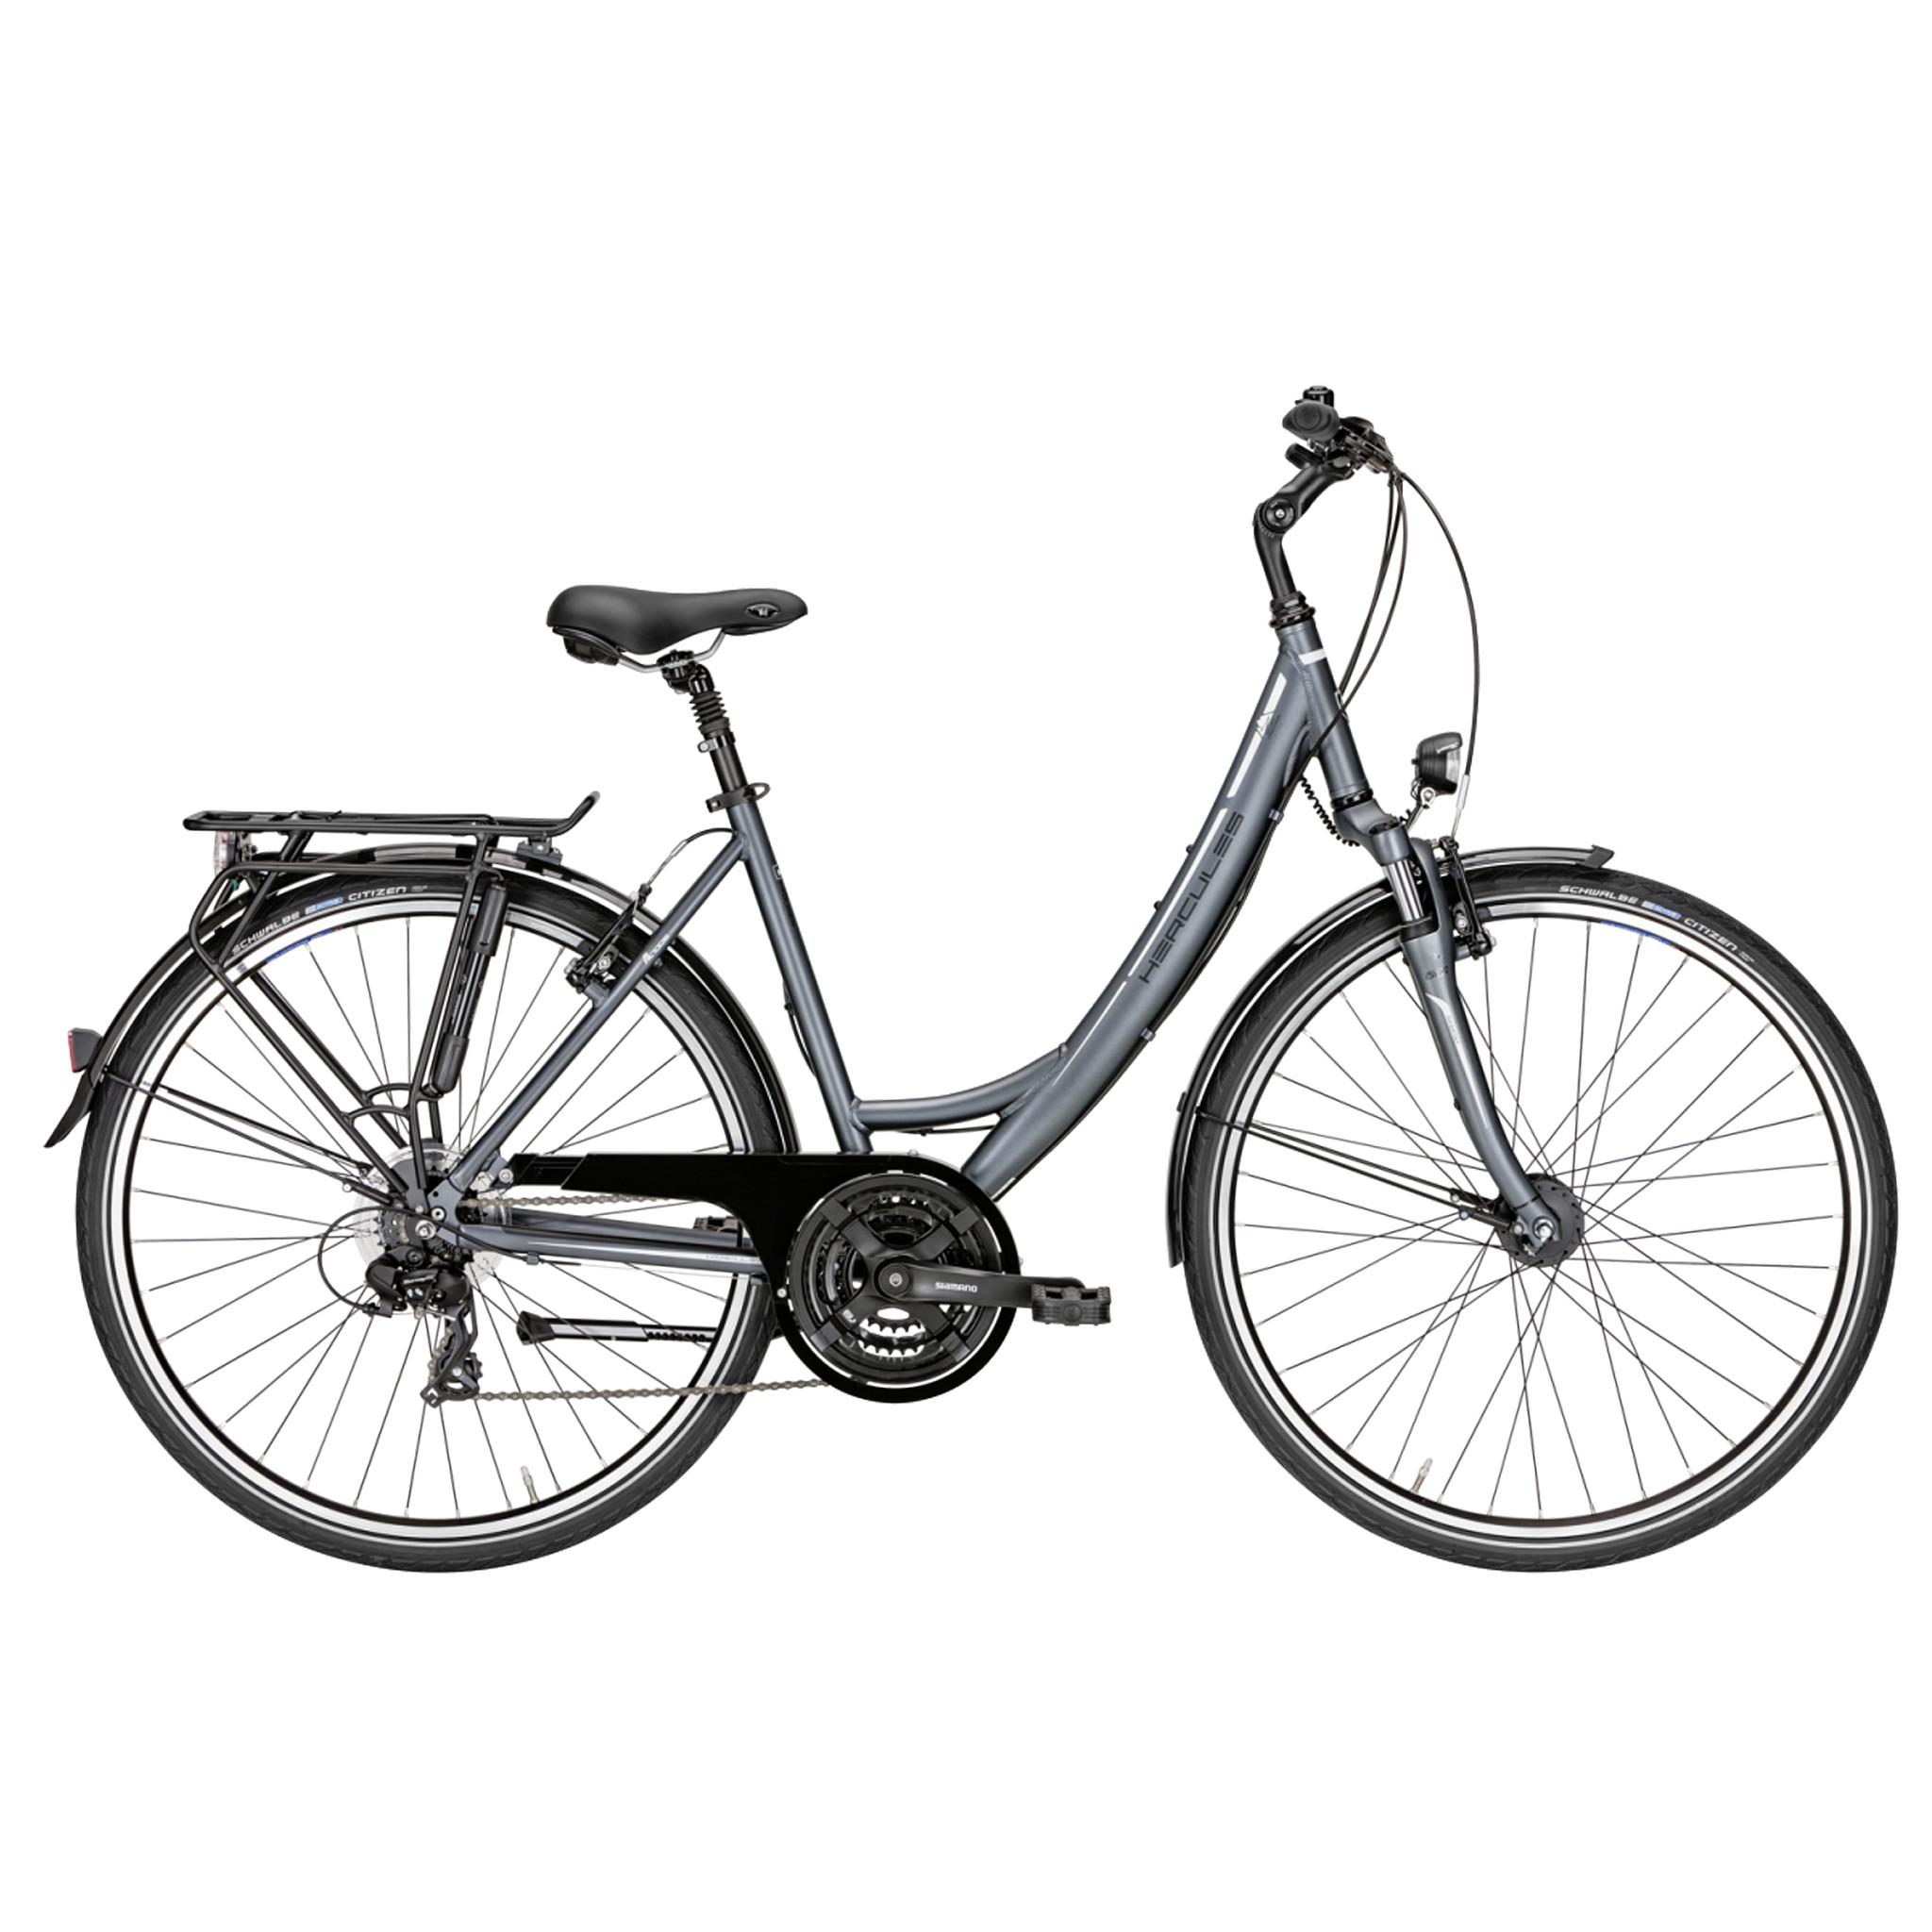 Hercules Sportieve fiets Tourer 21 dames grijs 45cm Grijs